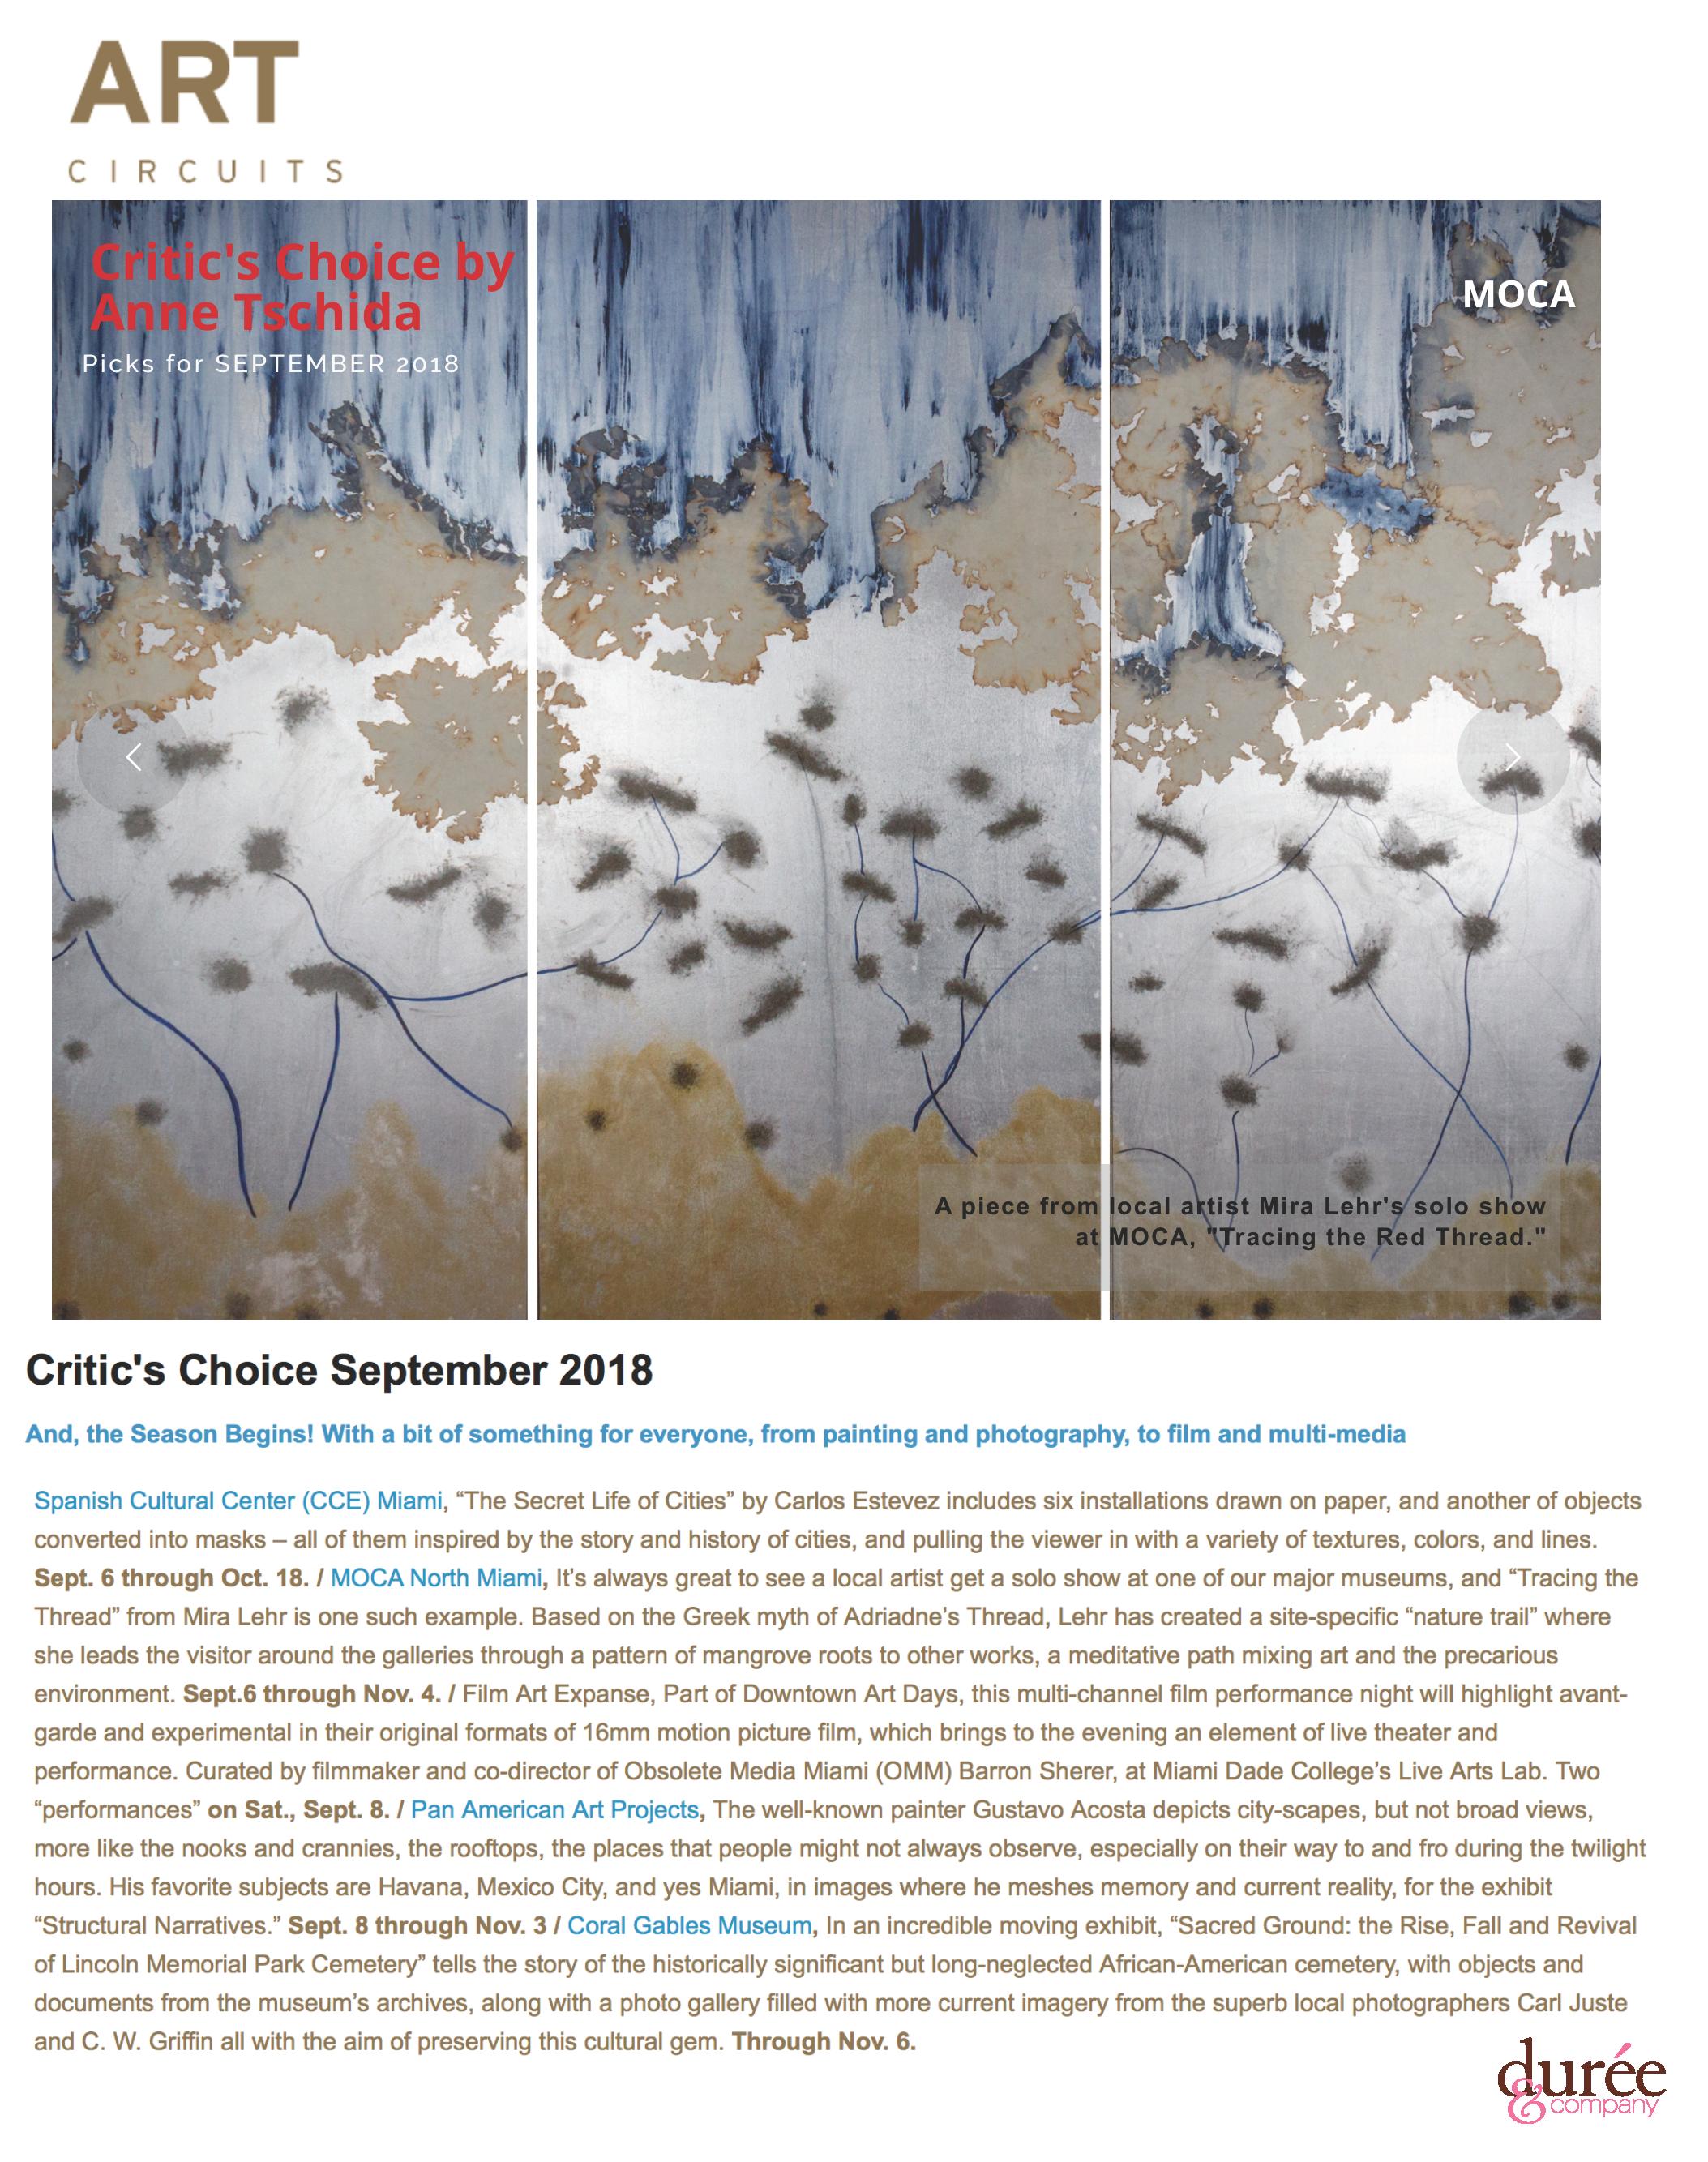 Art Circuits - MOCA - Critic's Choice by Anne Tschida - 8-28-2018.png